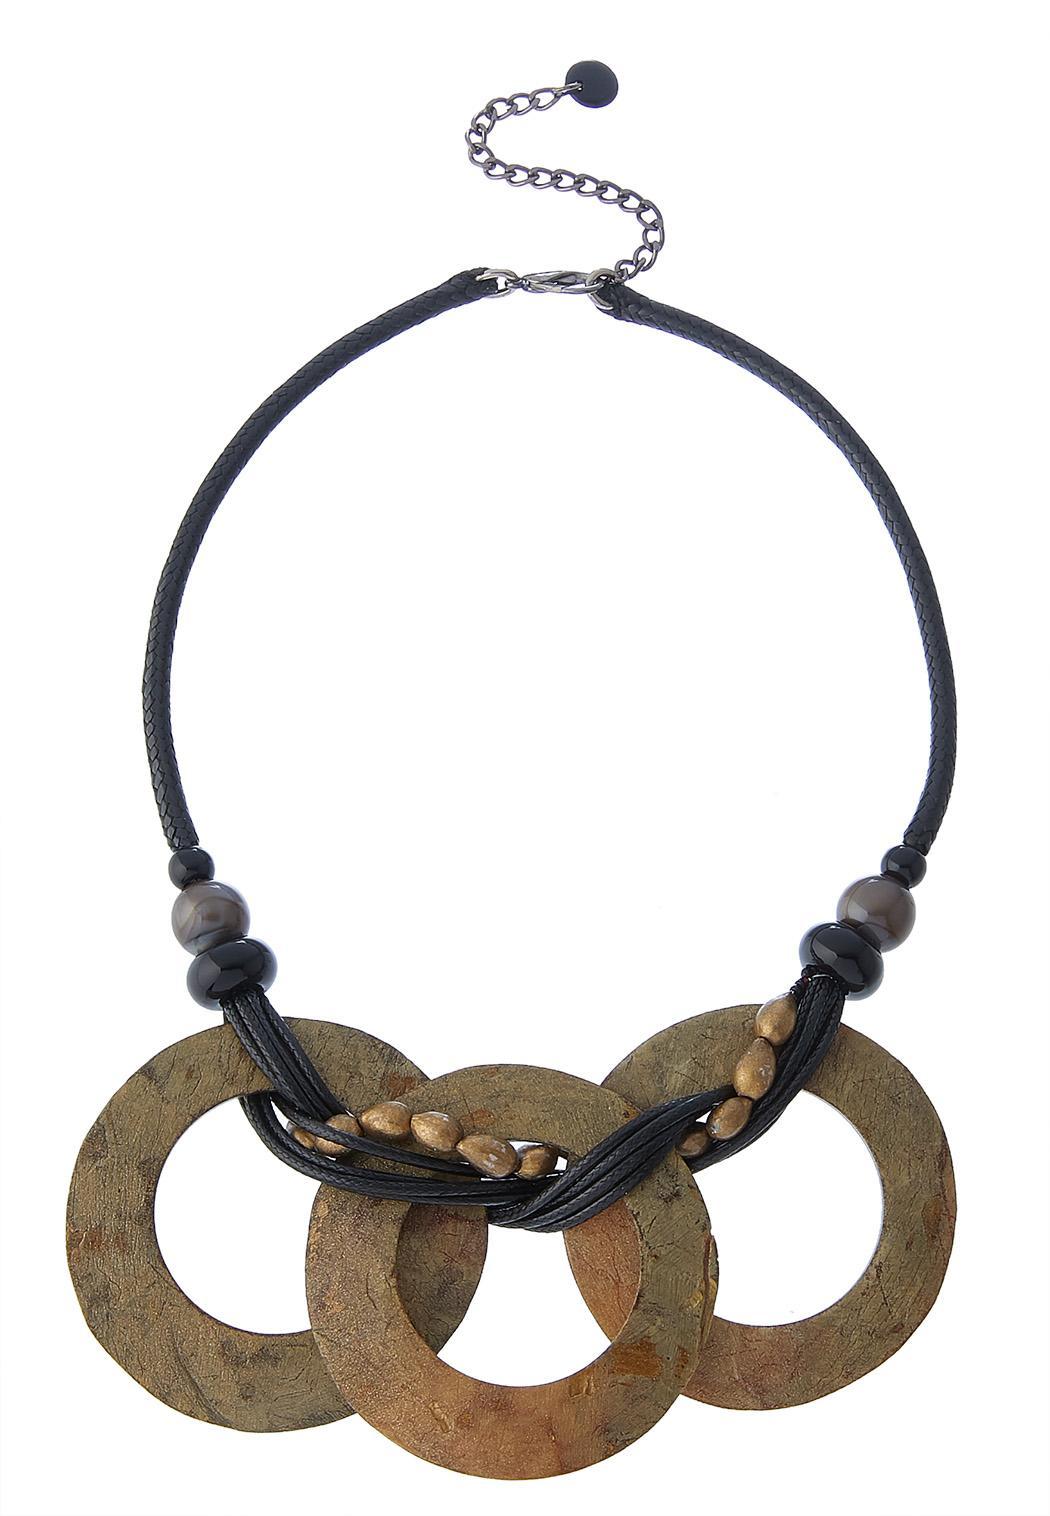 Interlocking Circle Cord Necklace